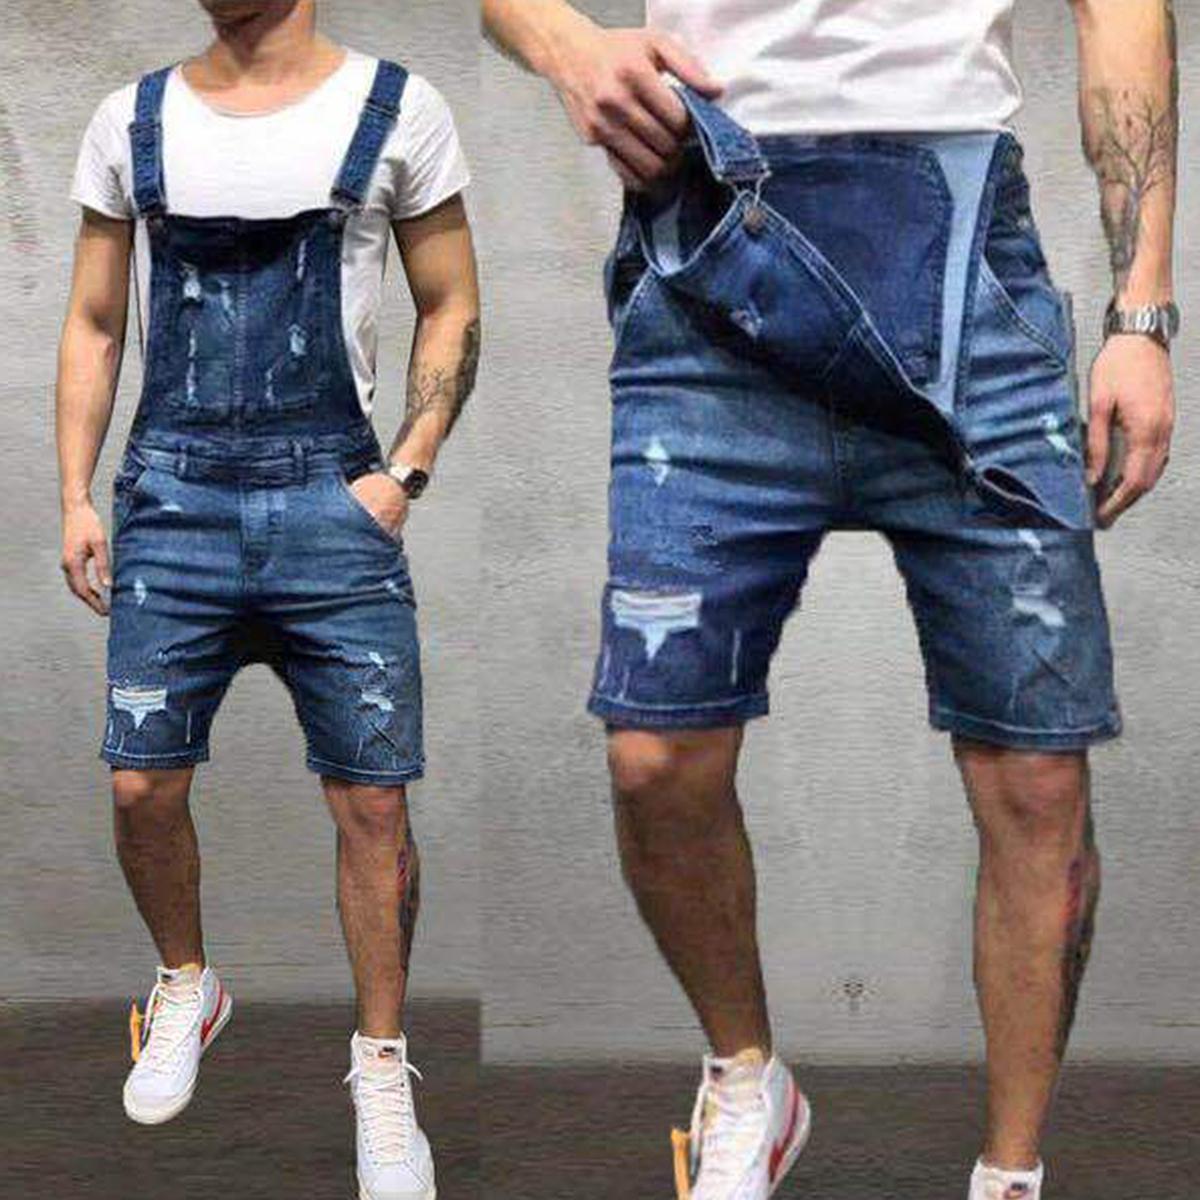 Correa-De-Hombre-Denim-Jeans-Mono-Mono-corto-Dungaree-Pantalones-Cortos-Deshilachados-Babero-En miniatura 13